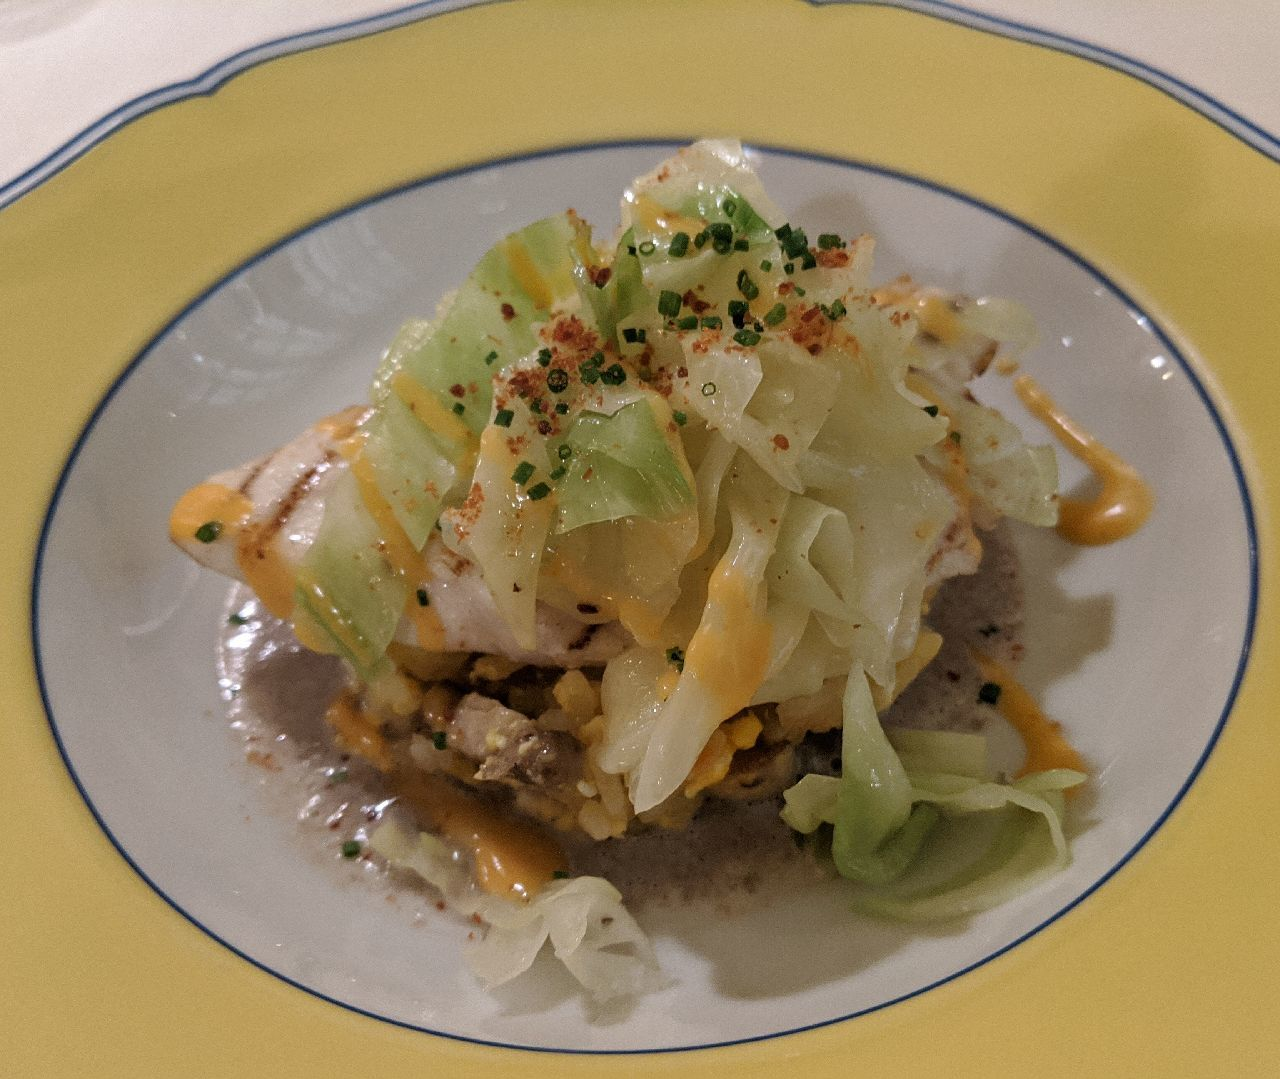 MVIMG_20200530_190058高知県産・メダイの網焼き、乾燥トマト風味、マッシュルームのソテーと卵のピラフのチーズ焼き